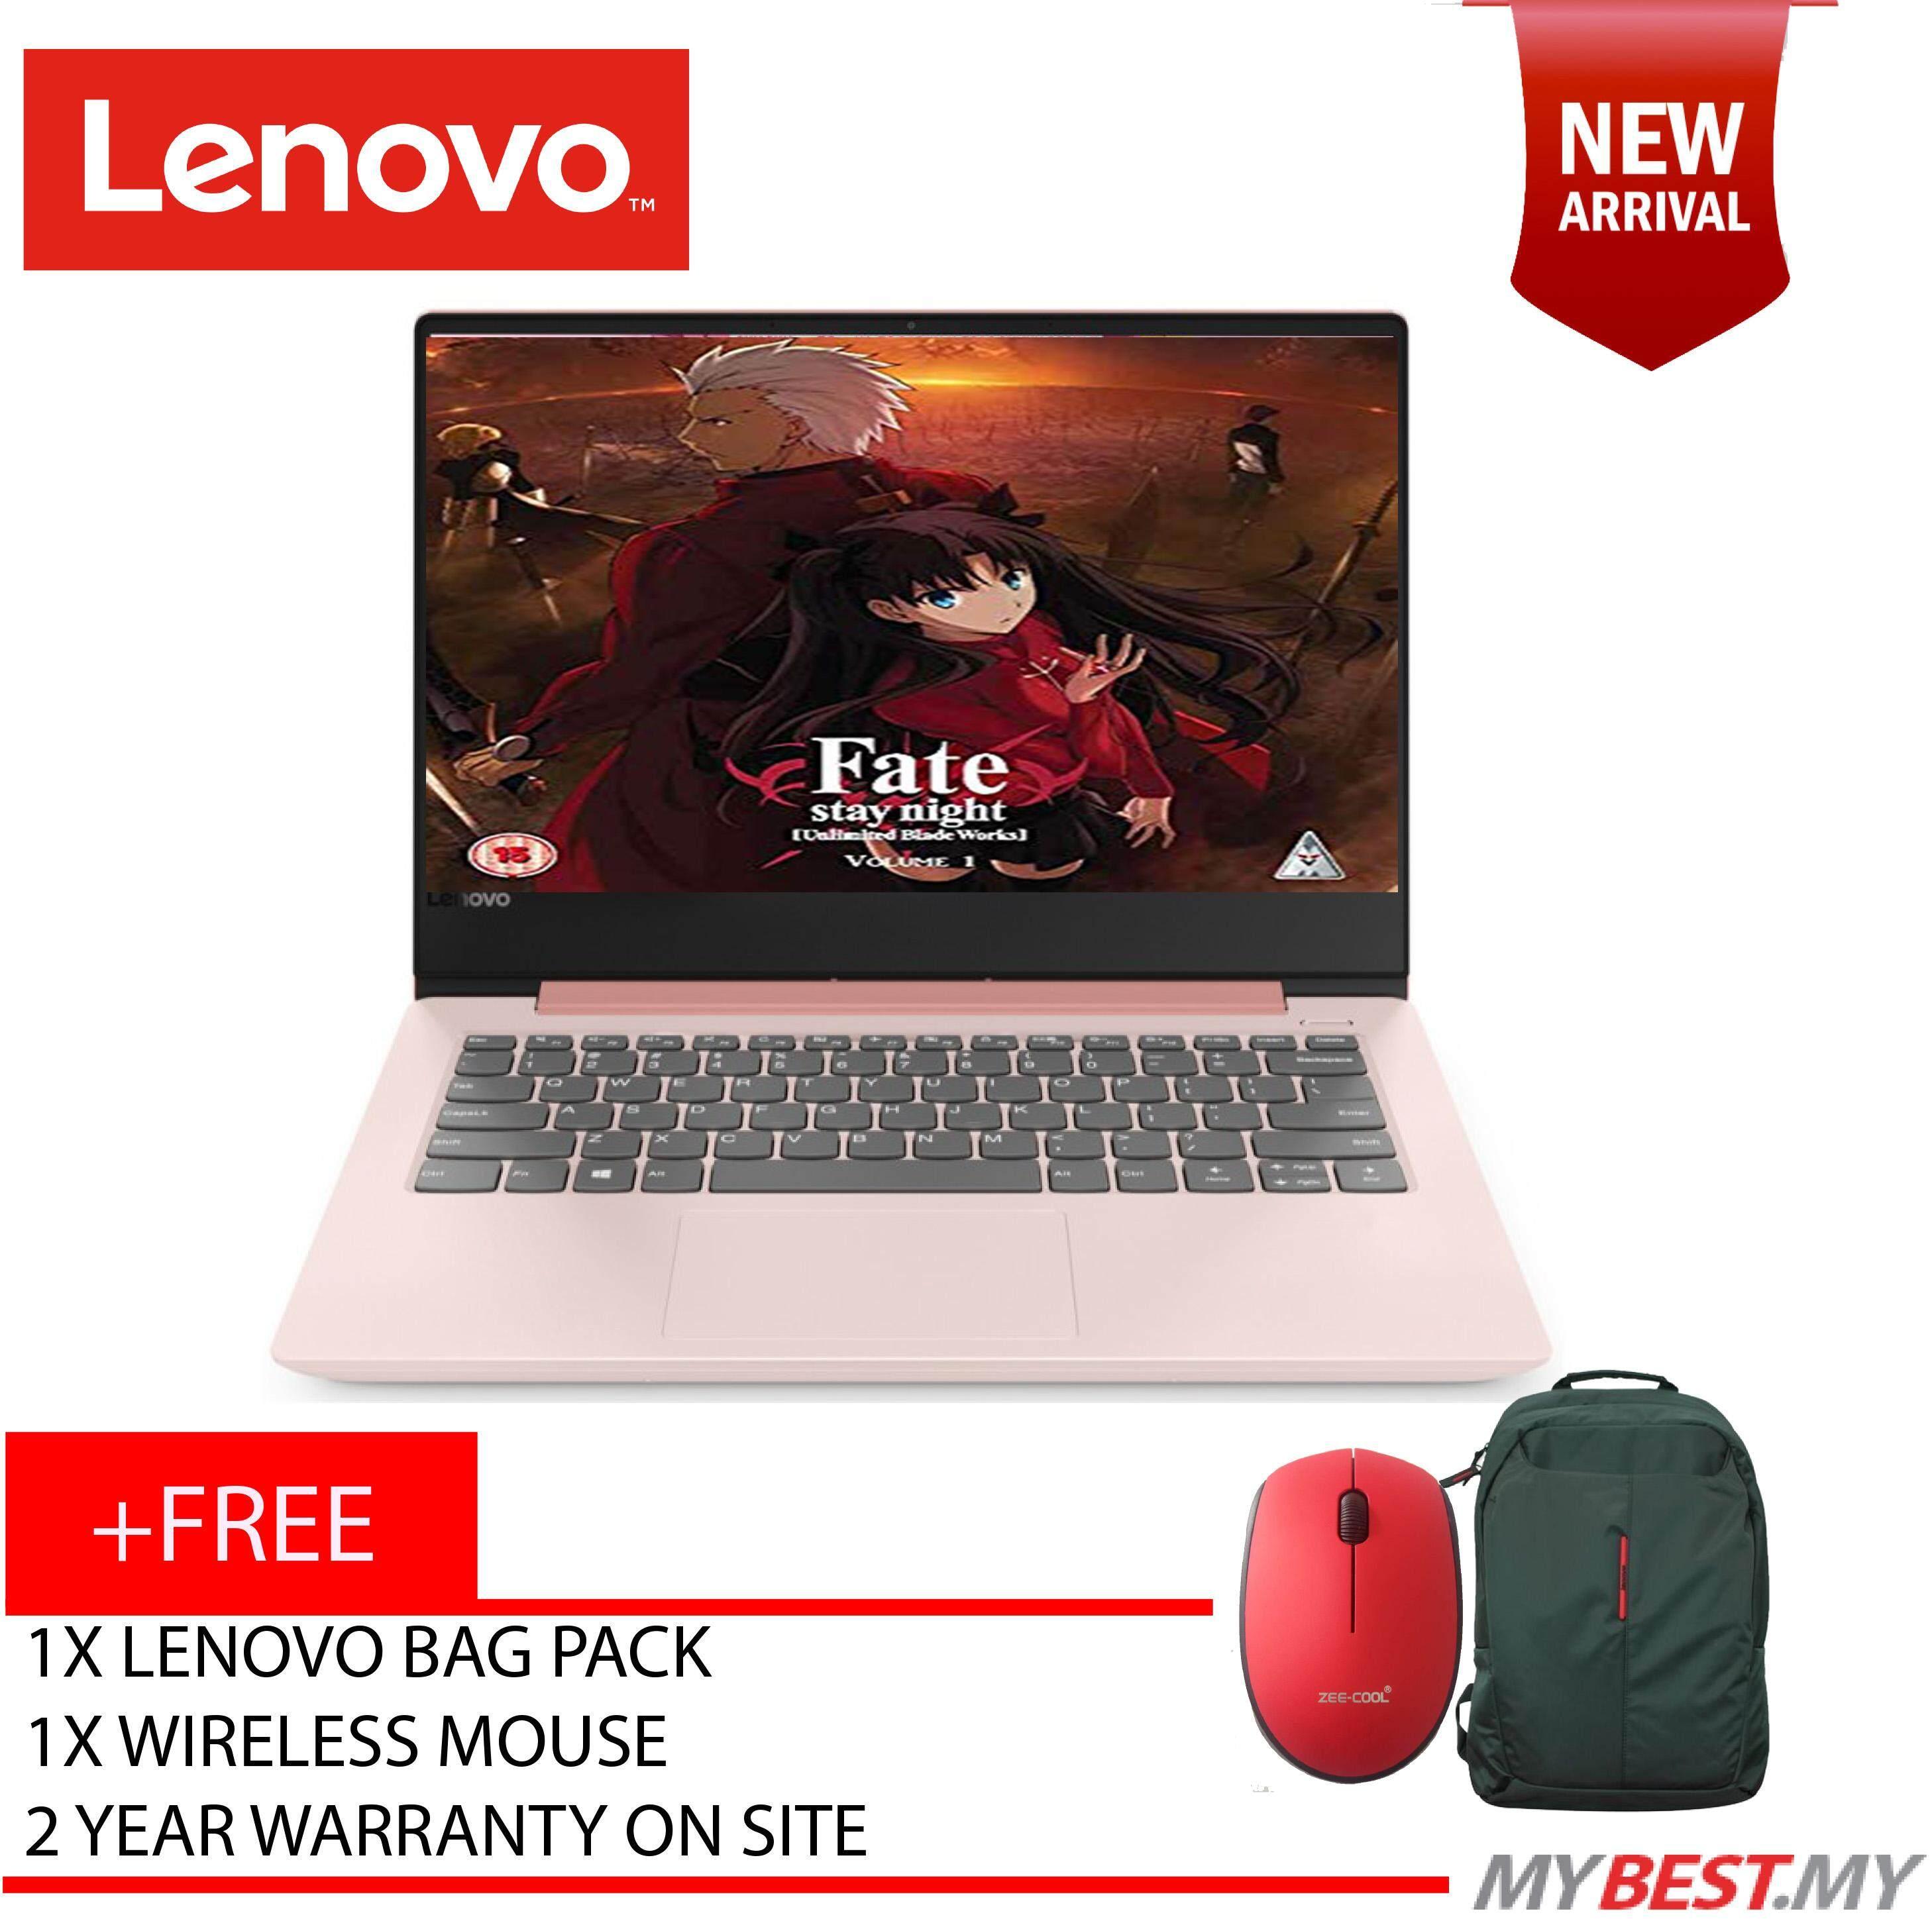 Lenovo Ideapad 330s-14IKB 81F400SHMJ 14 FHD Laptop Rose Pink (I5-8250U, 4GB, 256GB, AMD 540 2GB W10) Malaysia